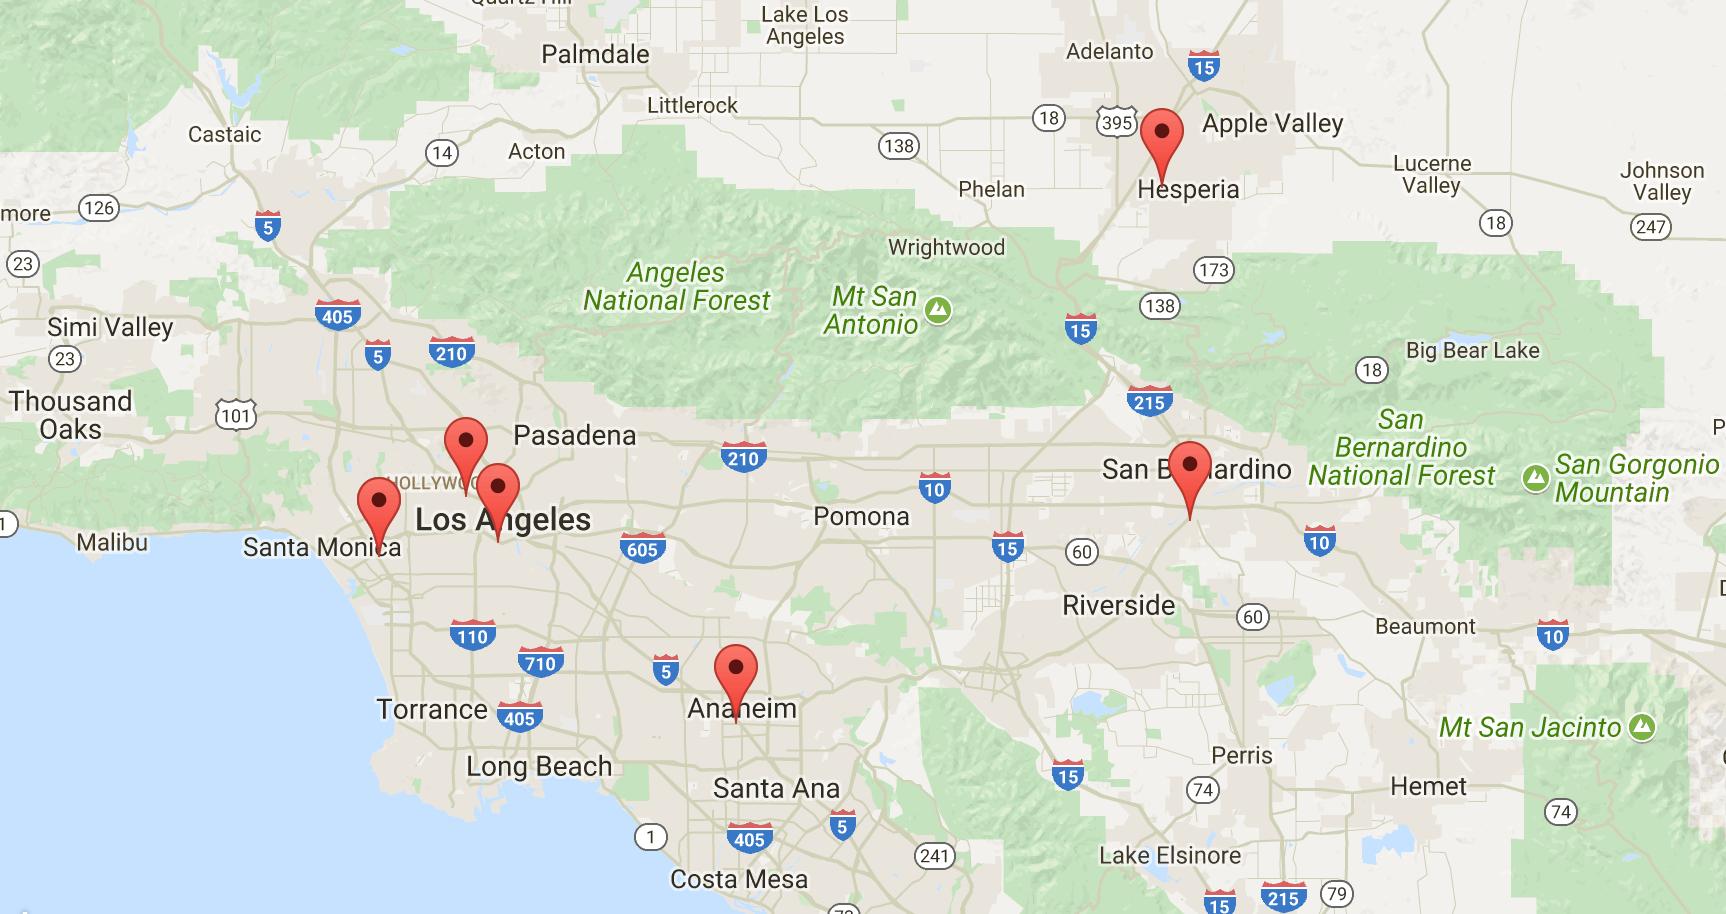 Six new Athena ATMs in and around Los Angeles, Anaheim, San Bernadino, and Hesperia!